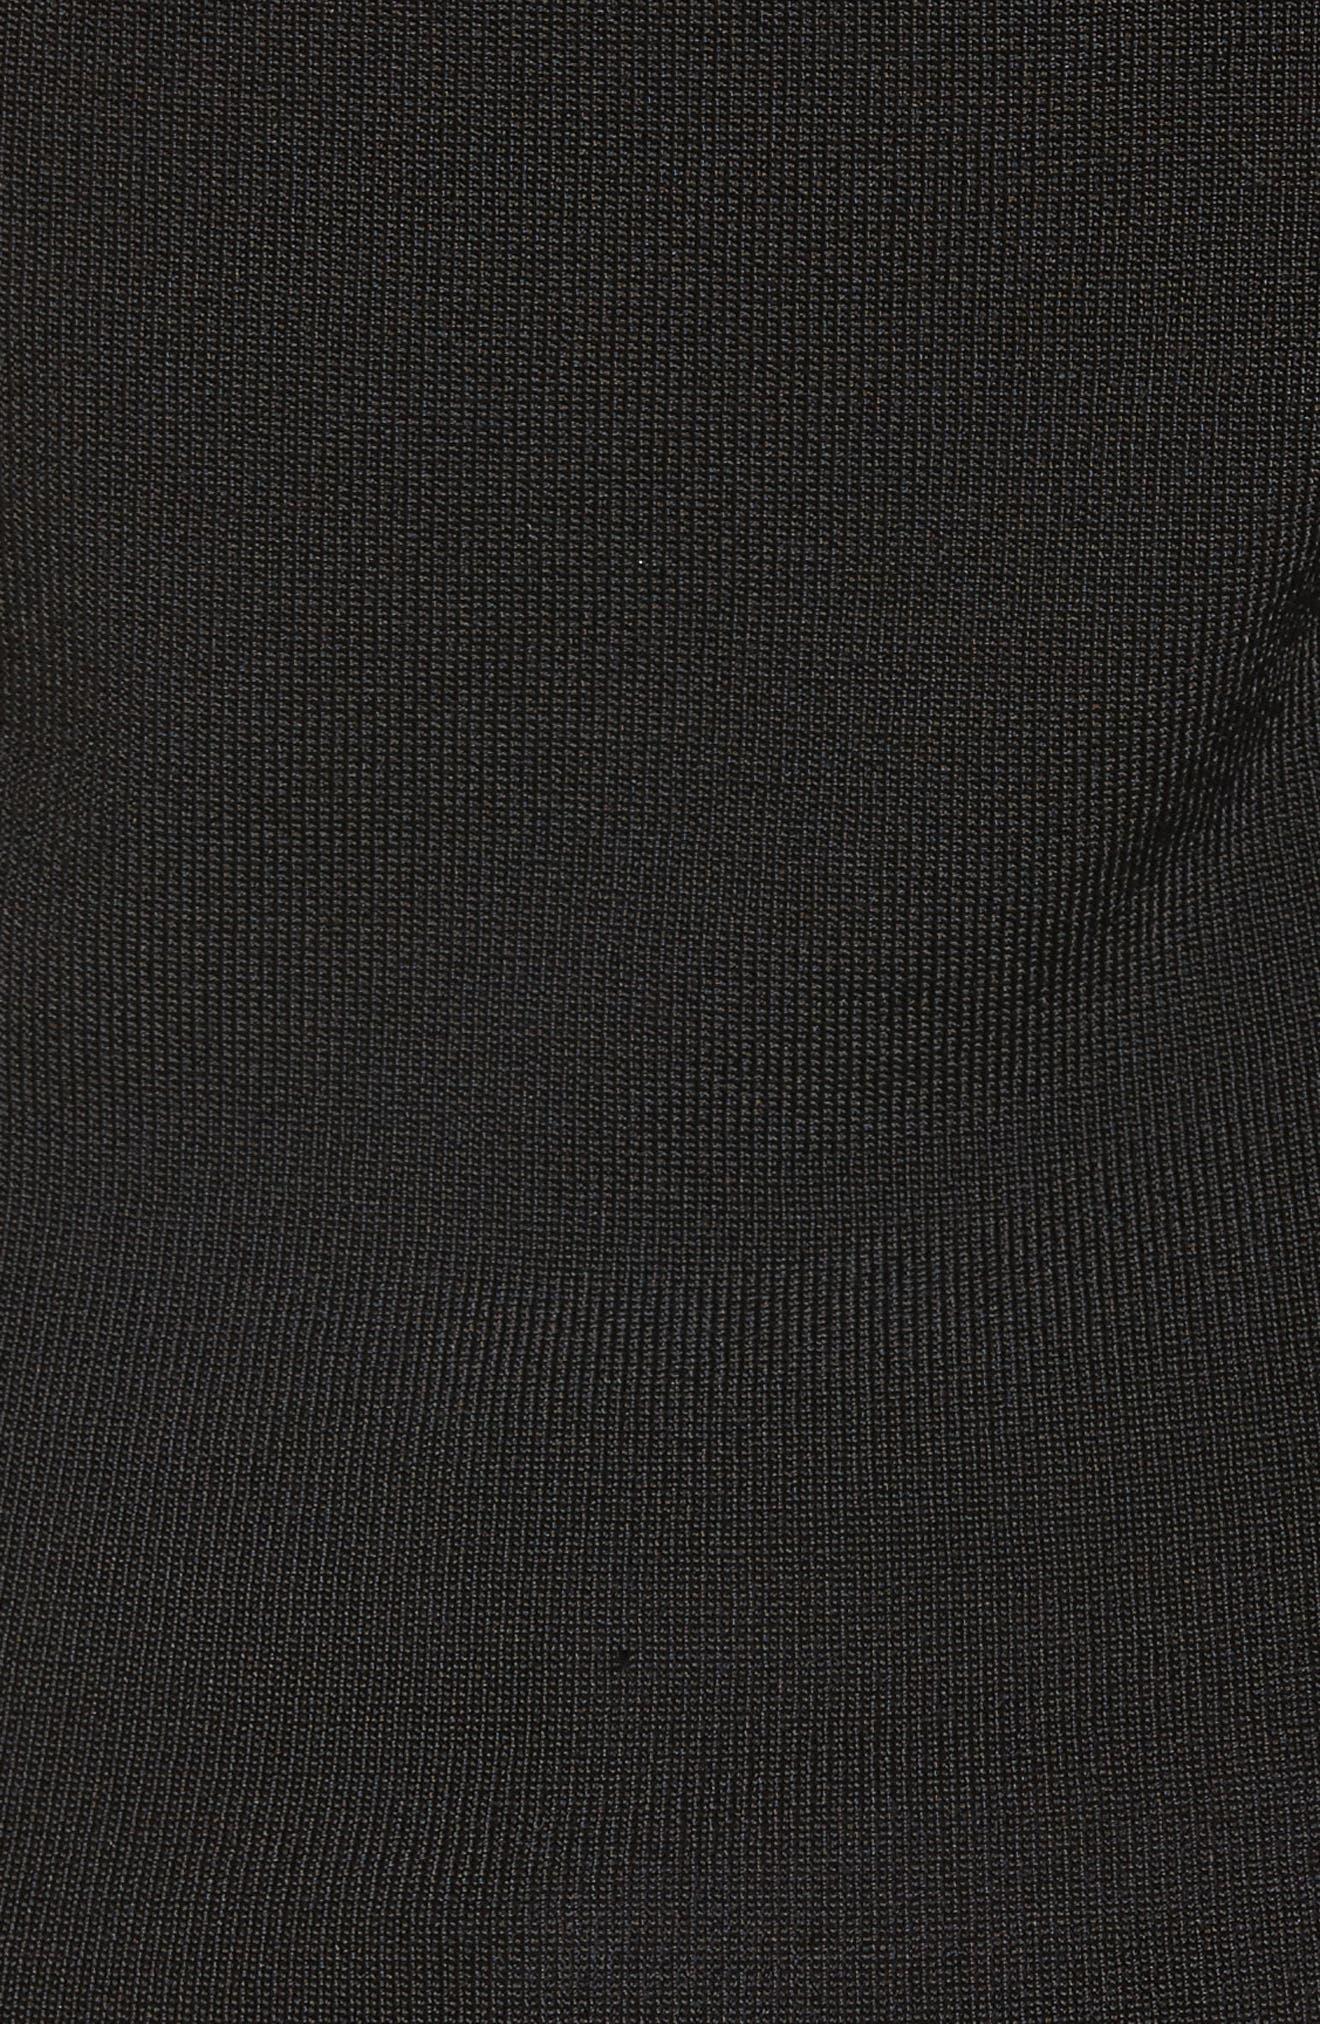 Cascading Ruffle One-Shoulder Top,                             Alternate thumbnail 5, color,                             Black